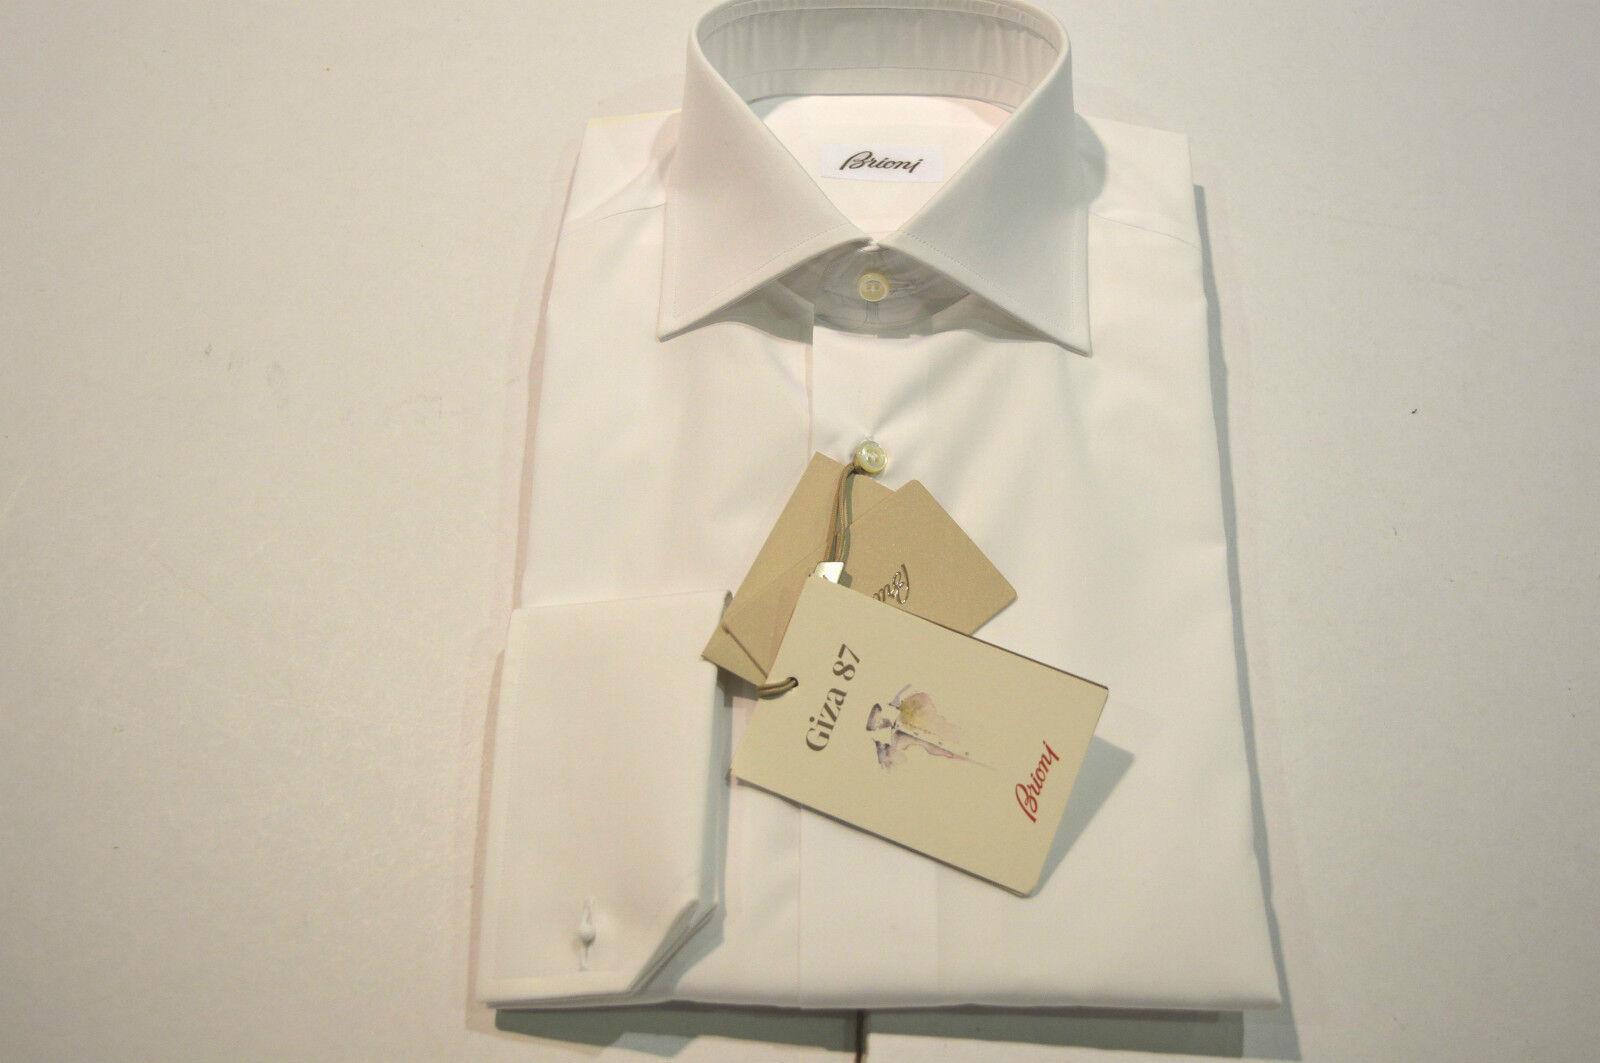 NEW  BRIONI Dress SHIRT 100% Cotton Size 15 Us 38 Eu  White  (Store Code AP6)